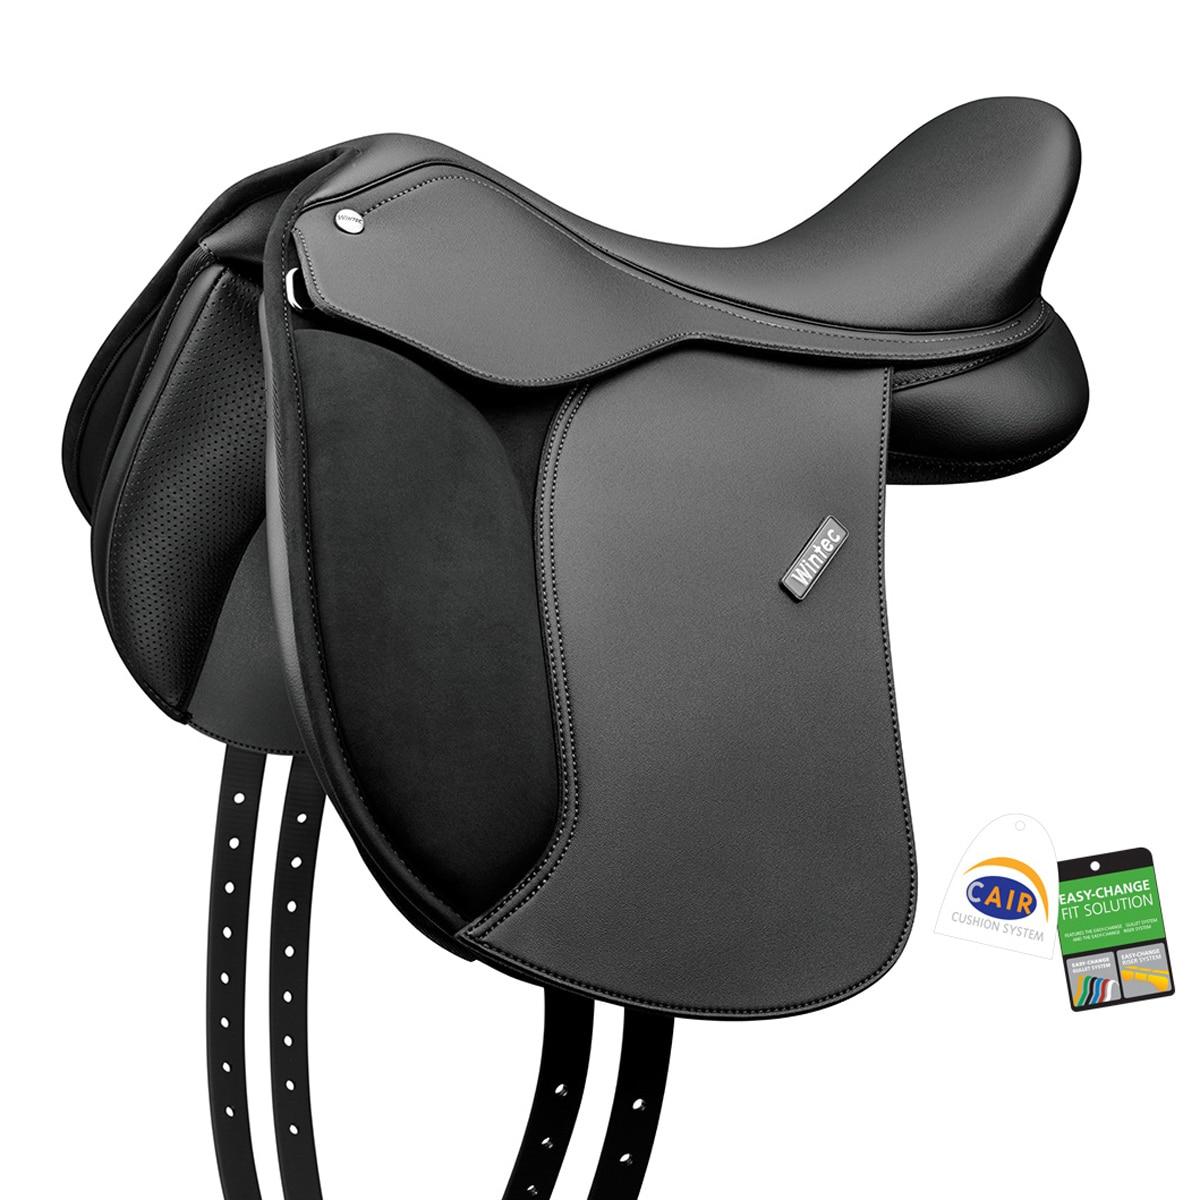 Wintec 500 Pony Dressage saddle w/CAIR